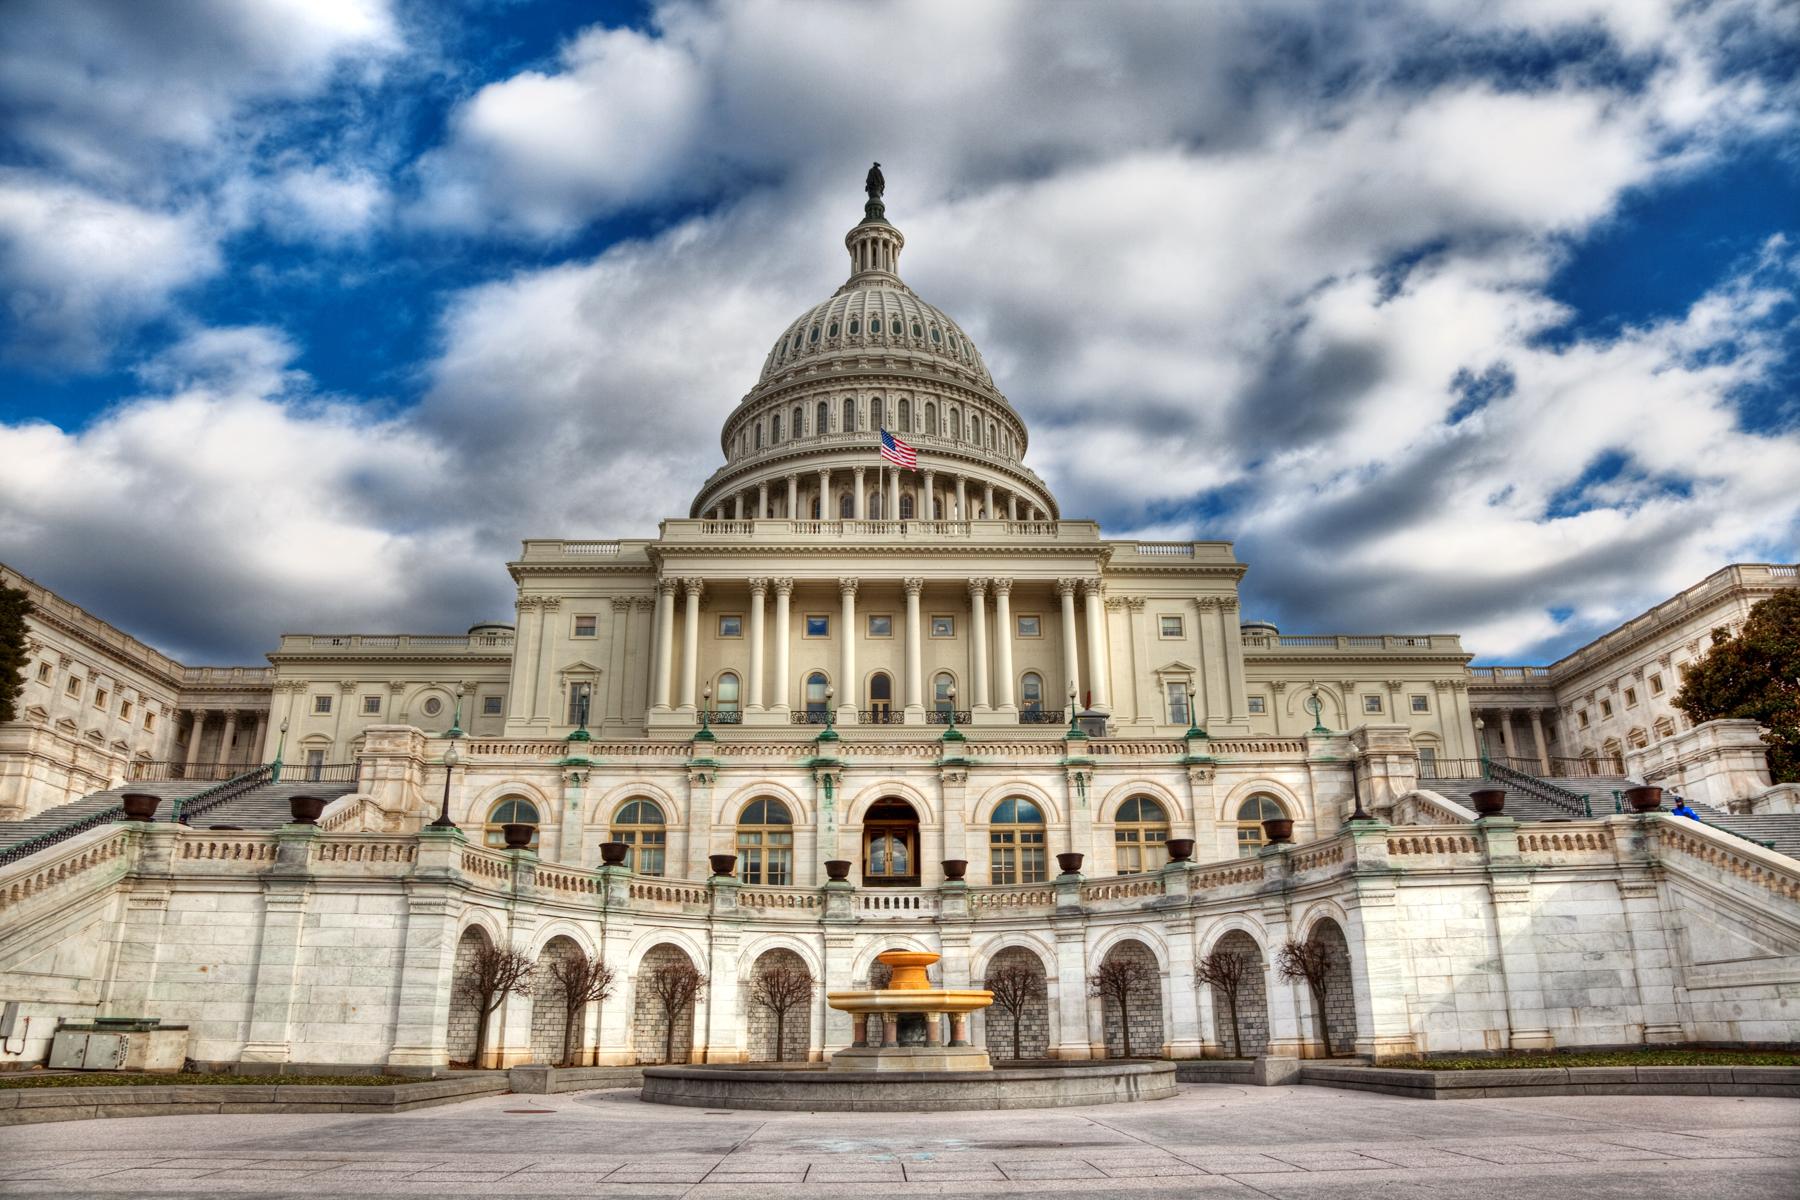 Washington DC Capitol - HDR, America, Senate, Photograph, Picture, HQ Photo